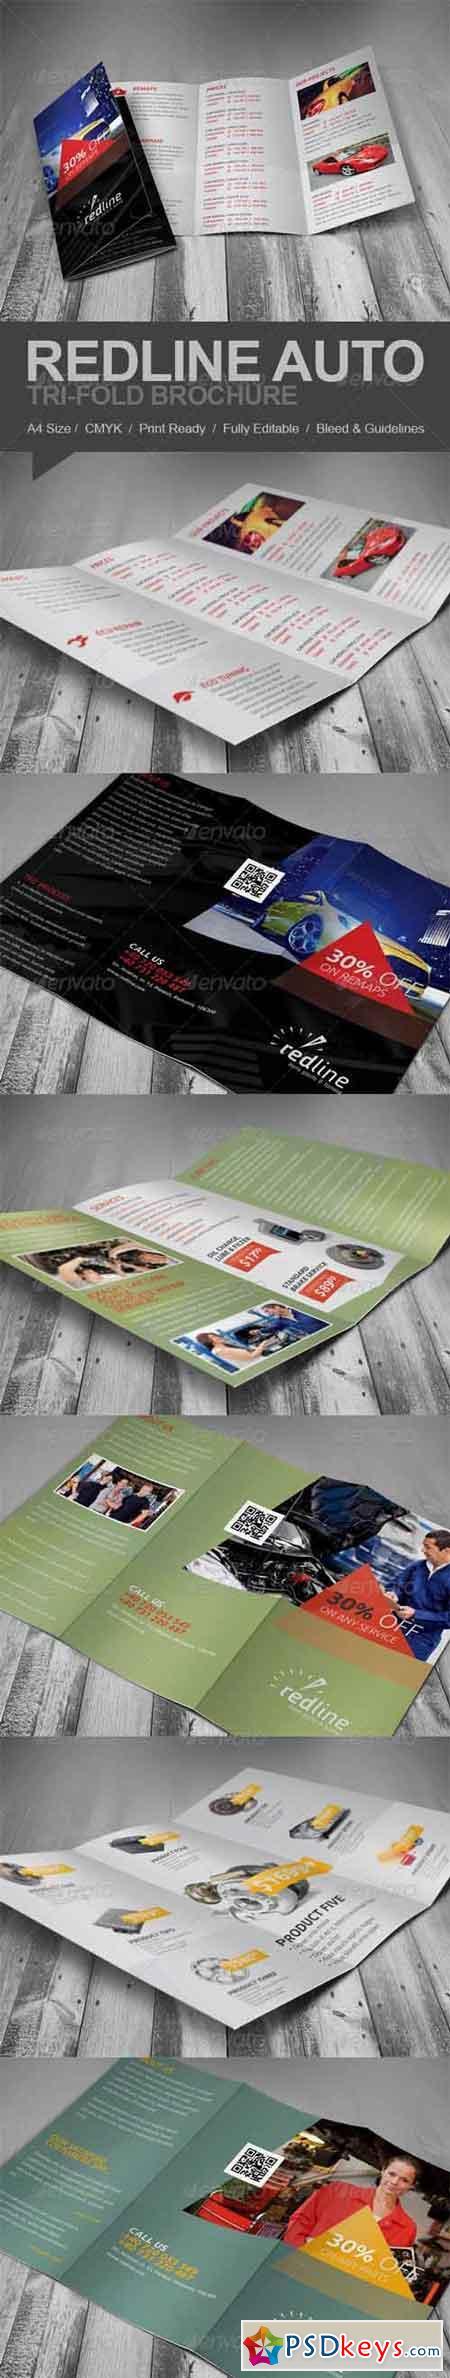 Redline Auto Tri-fold Brochure 5809238